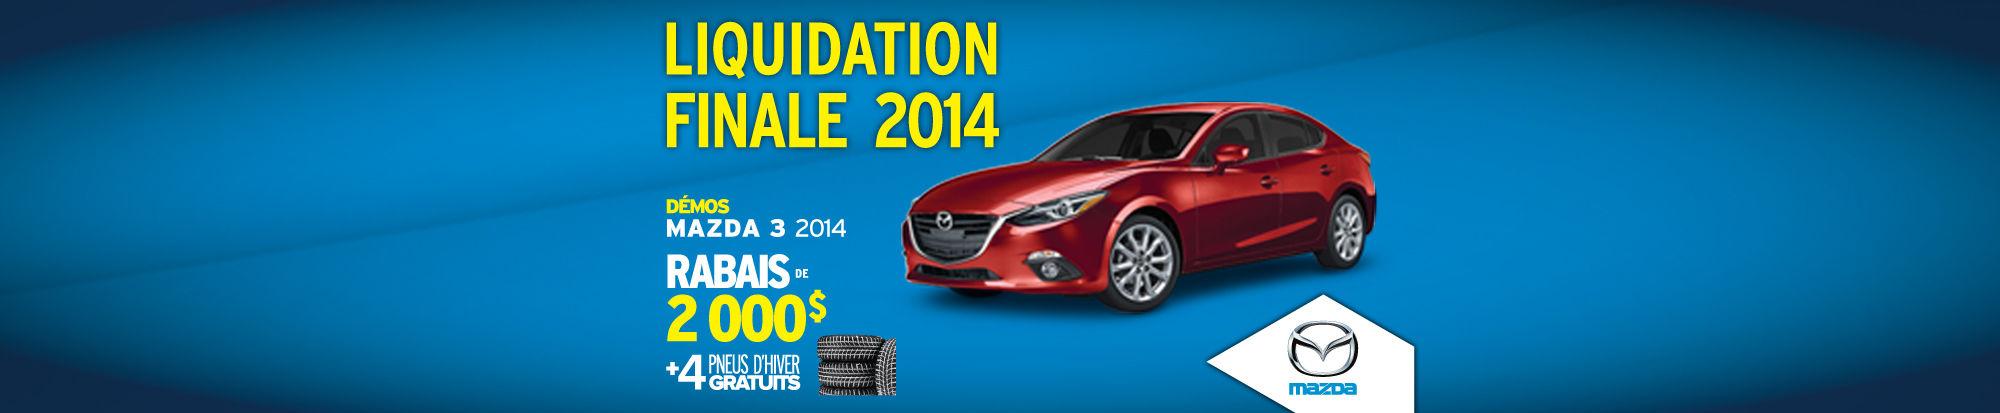 Mazda3 2014 liquidation